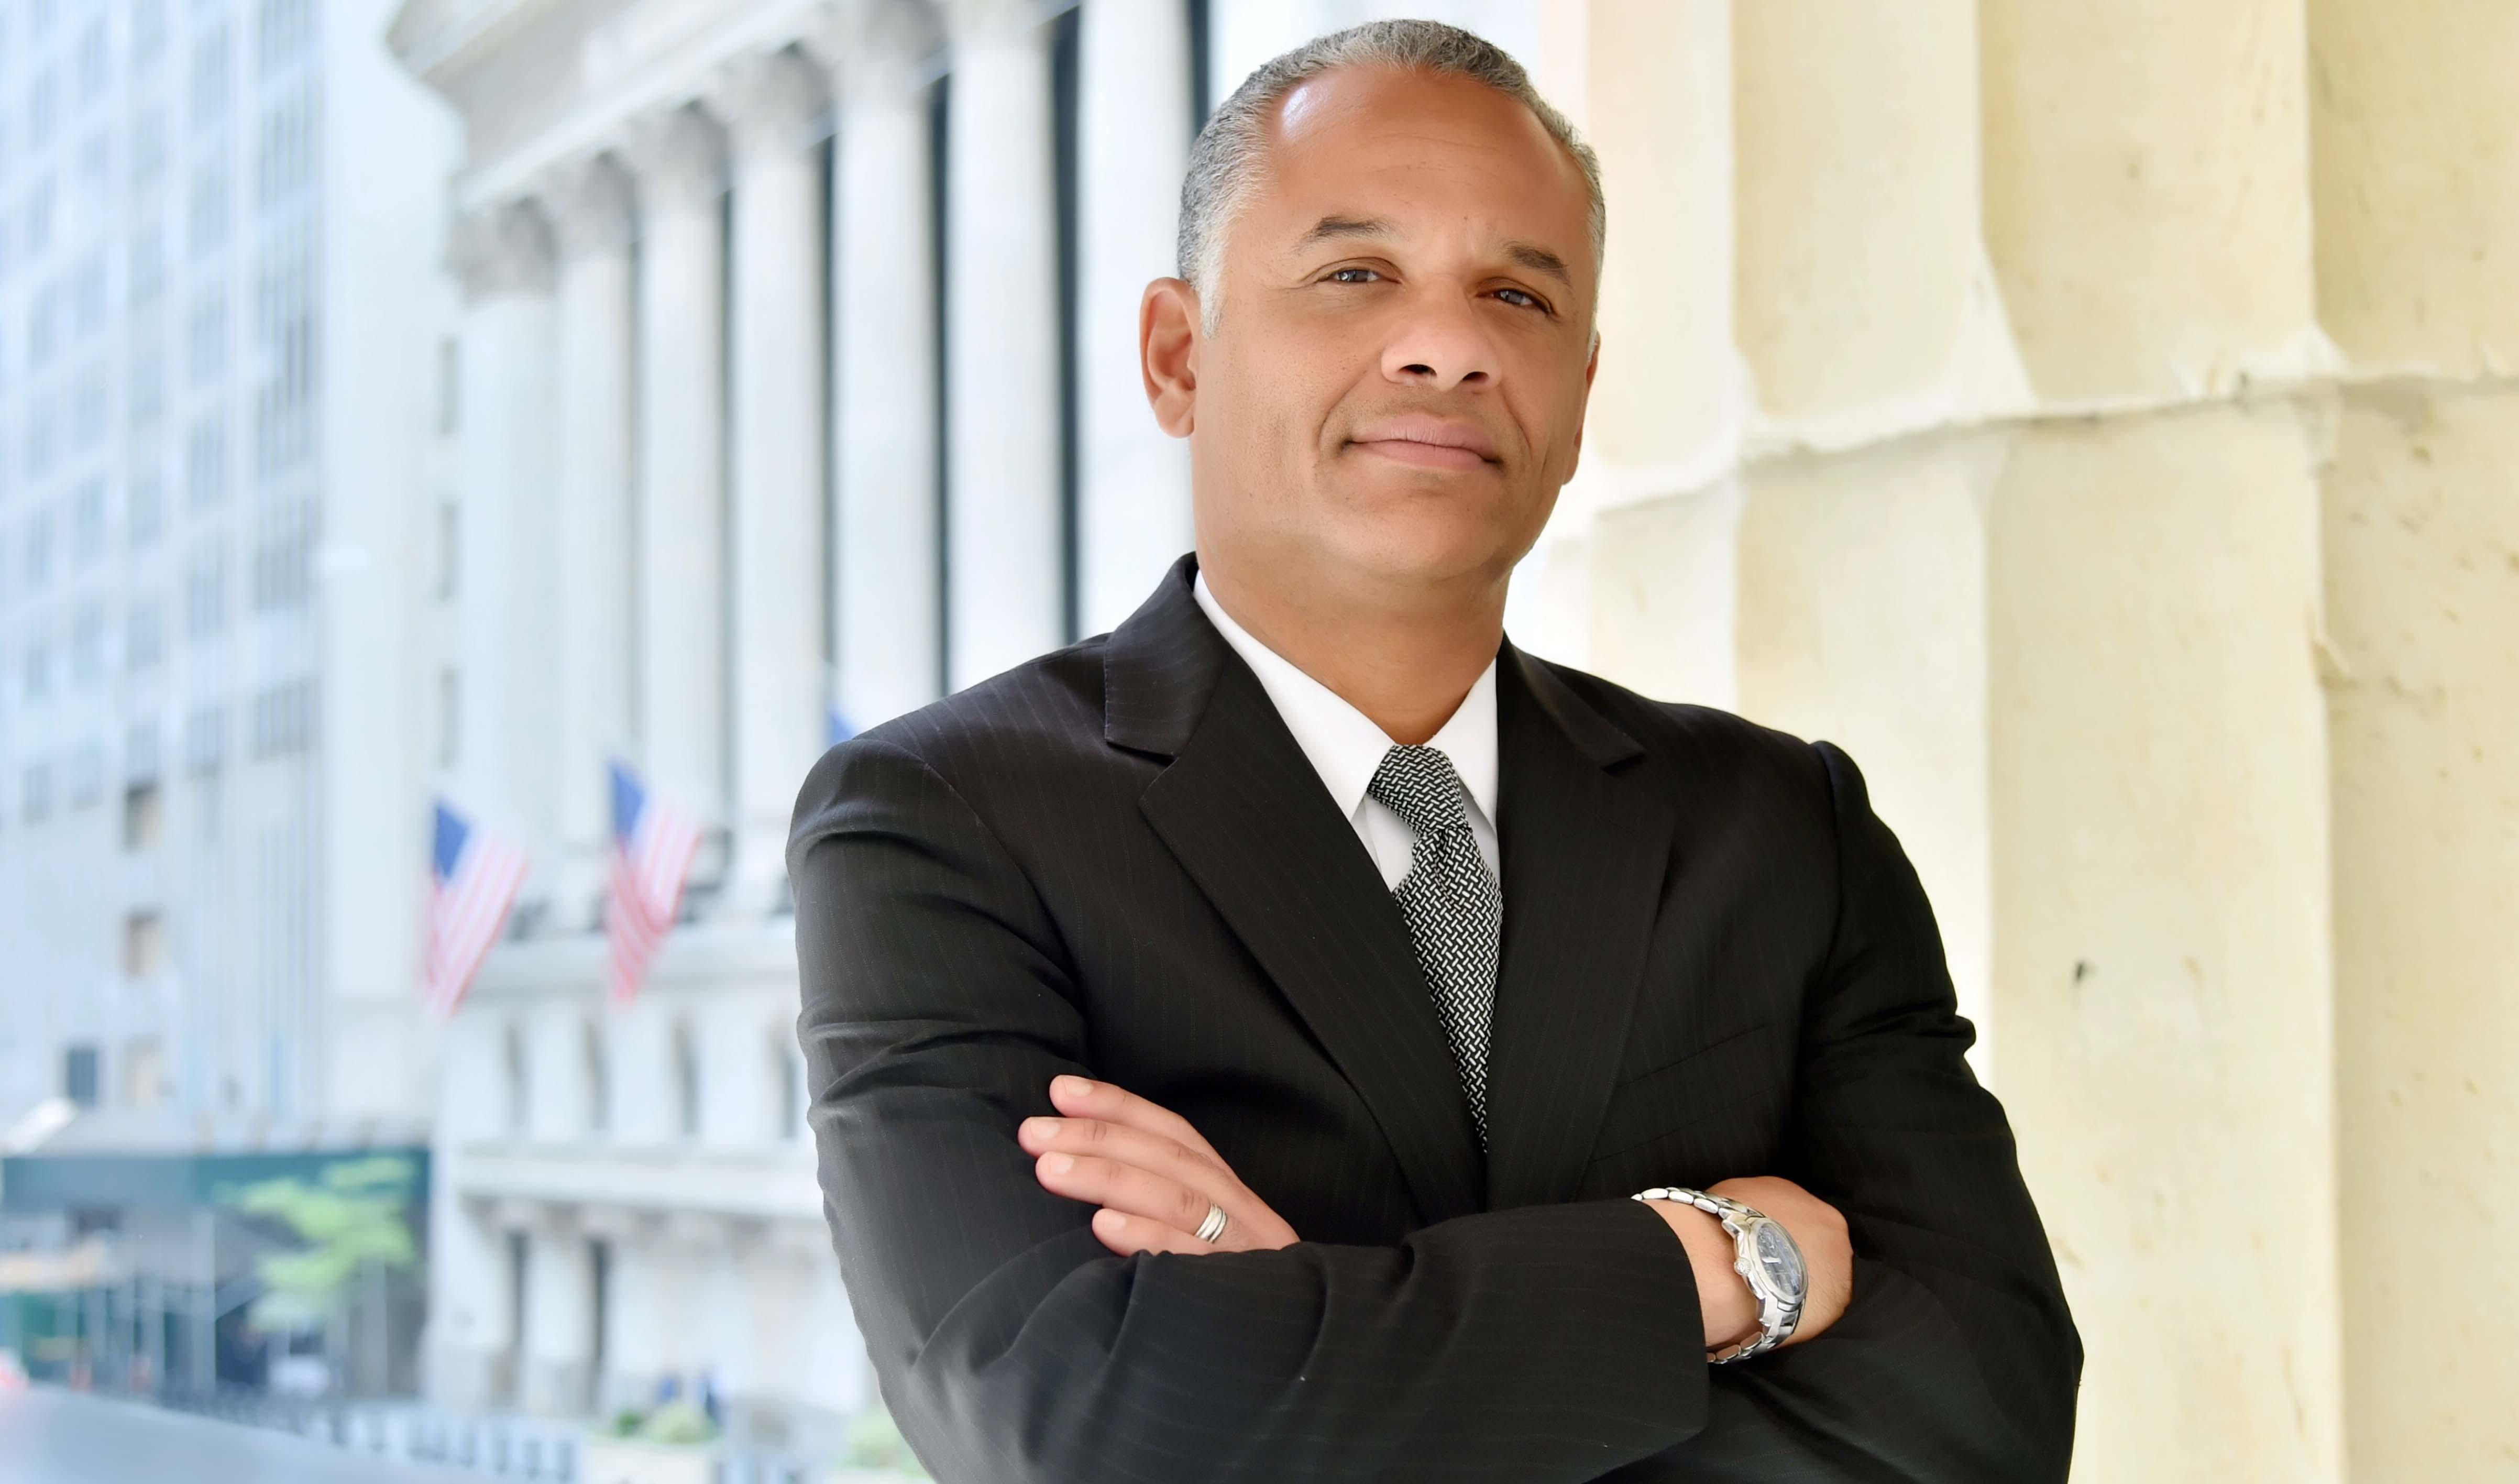 Jordan Thomas Distinguished Leader NYLJ